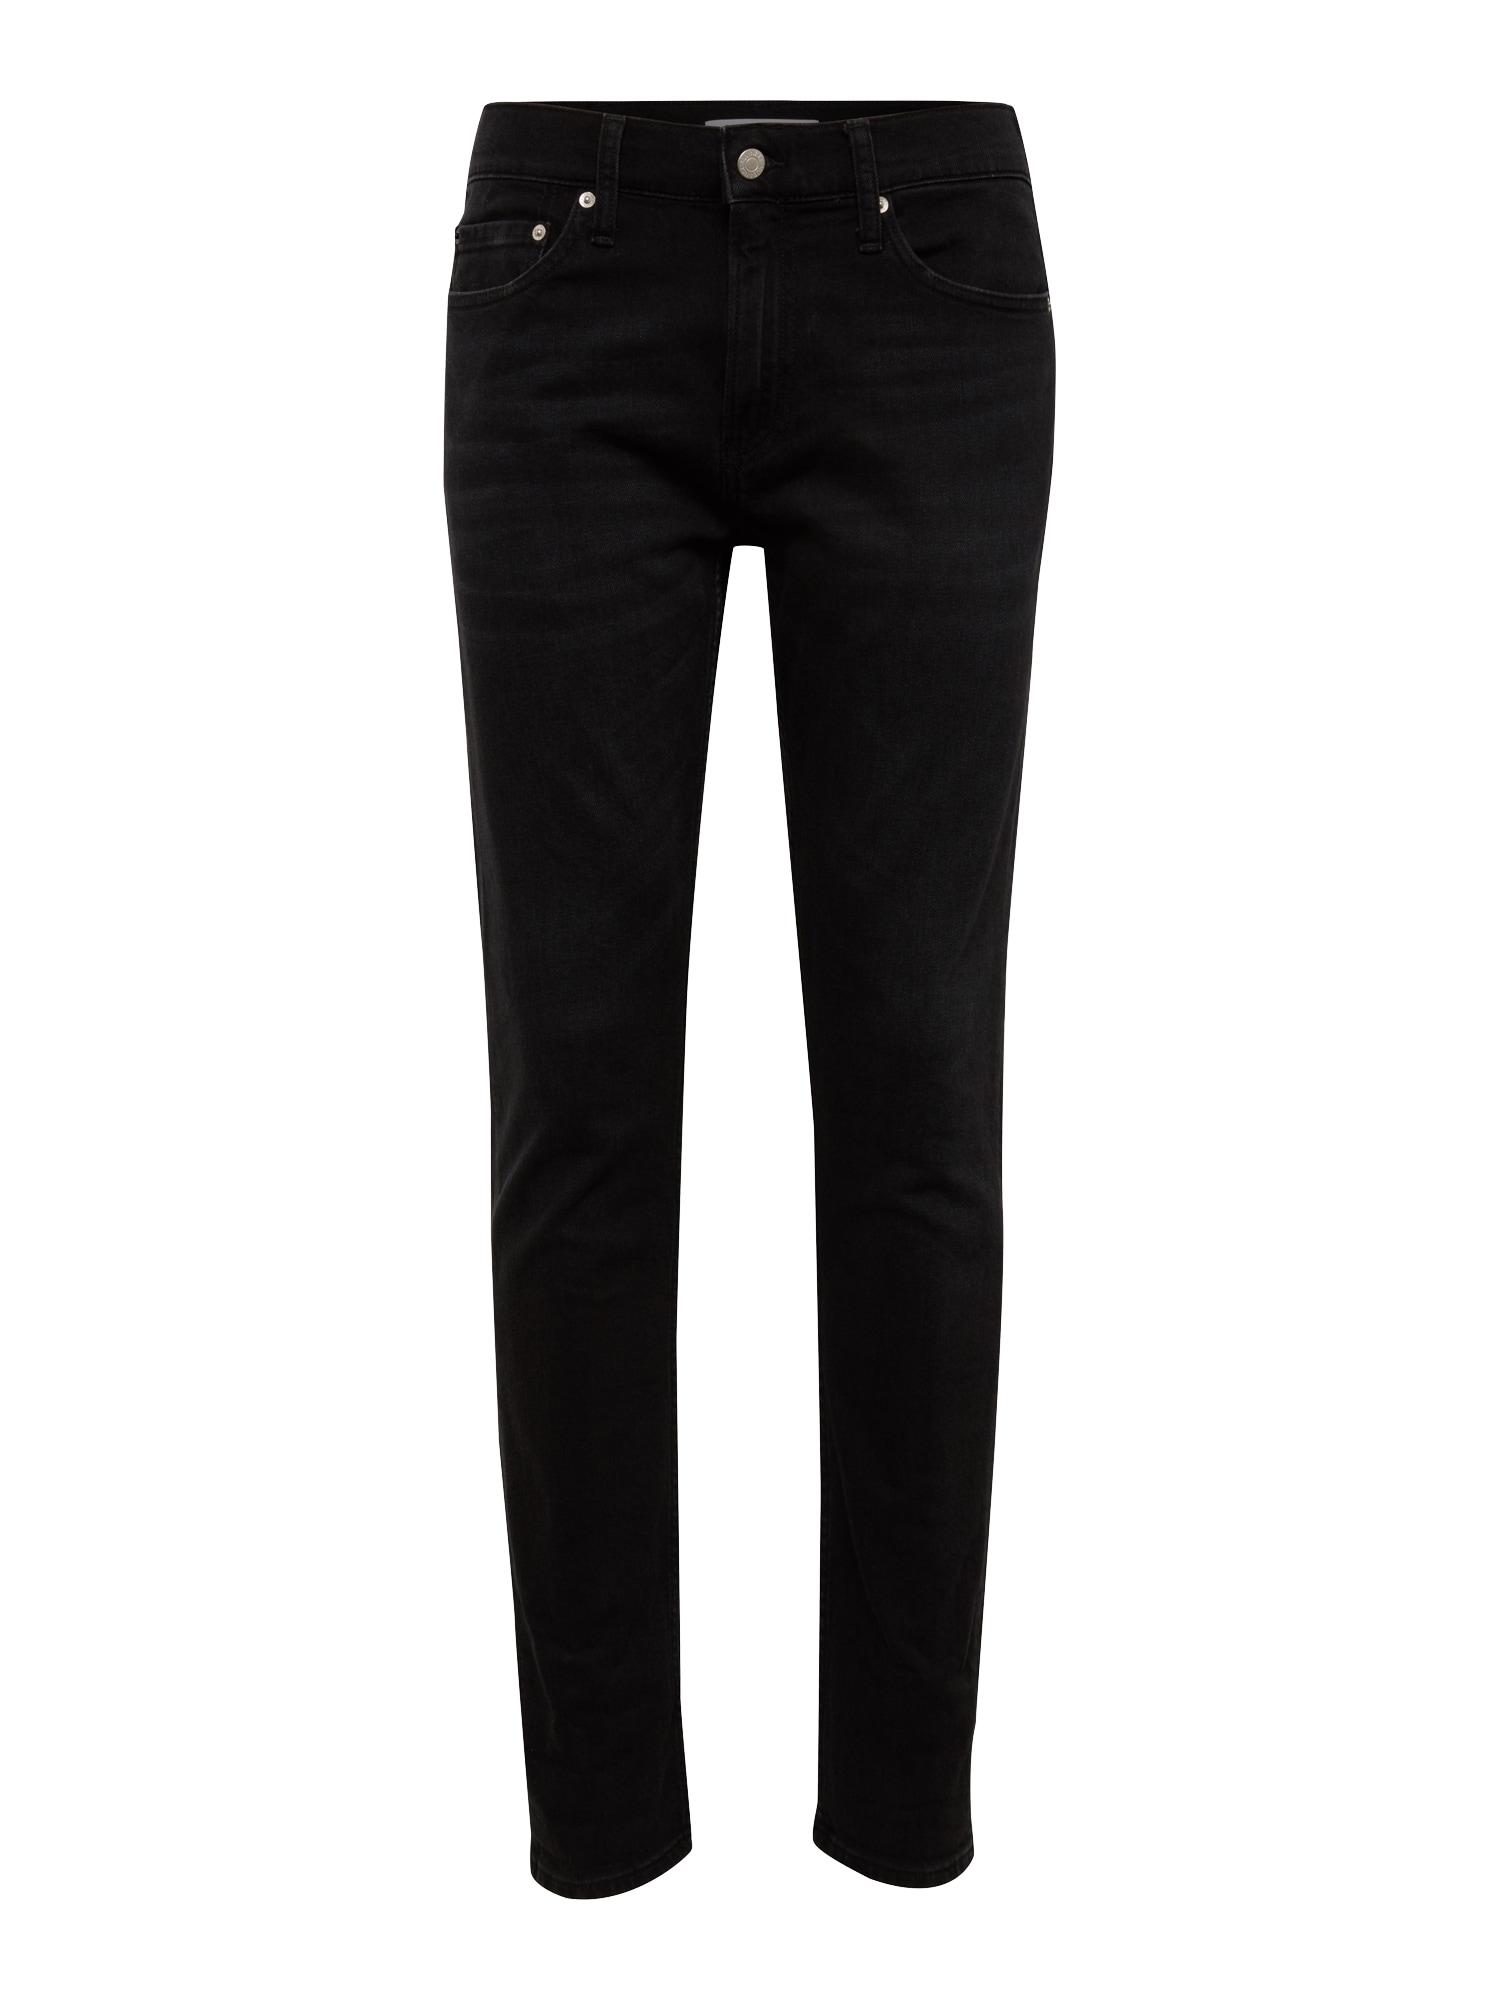 Calvin Klein Jeans Džinsai 'CKJ 026 SLIM' juodo džinso spalva